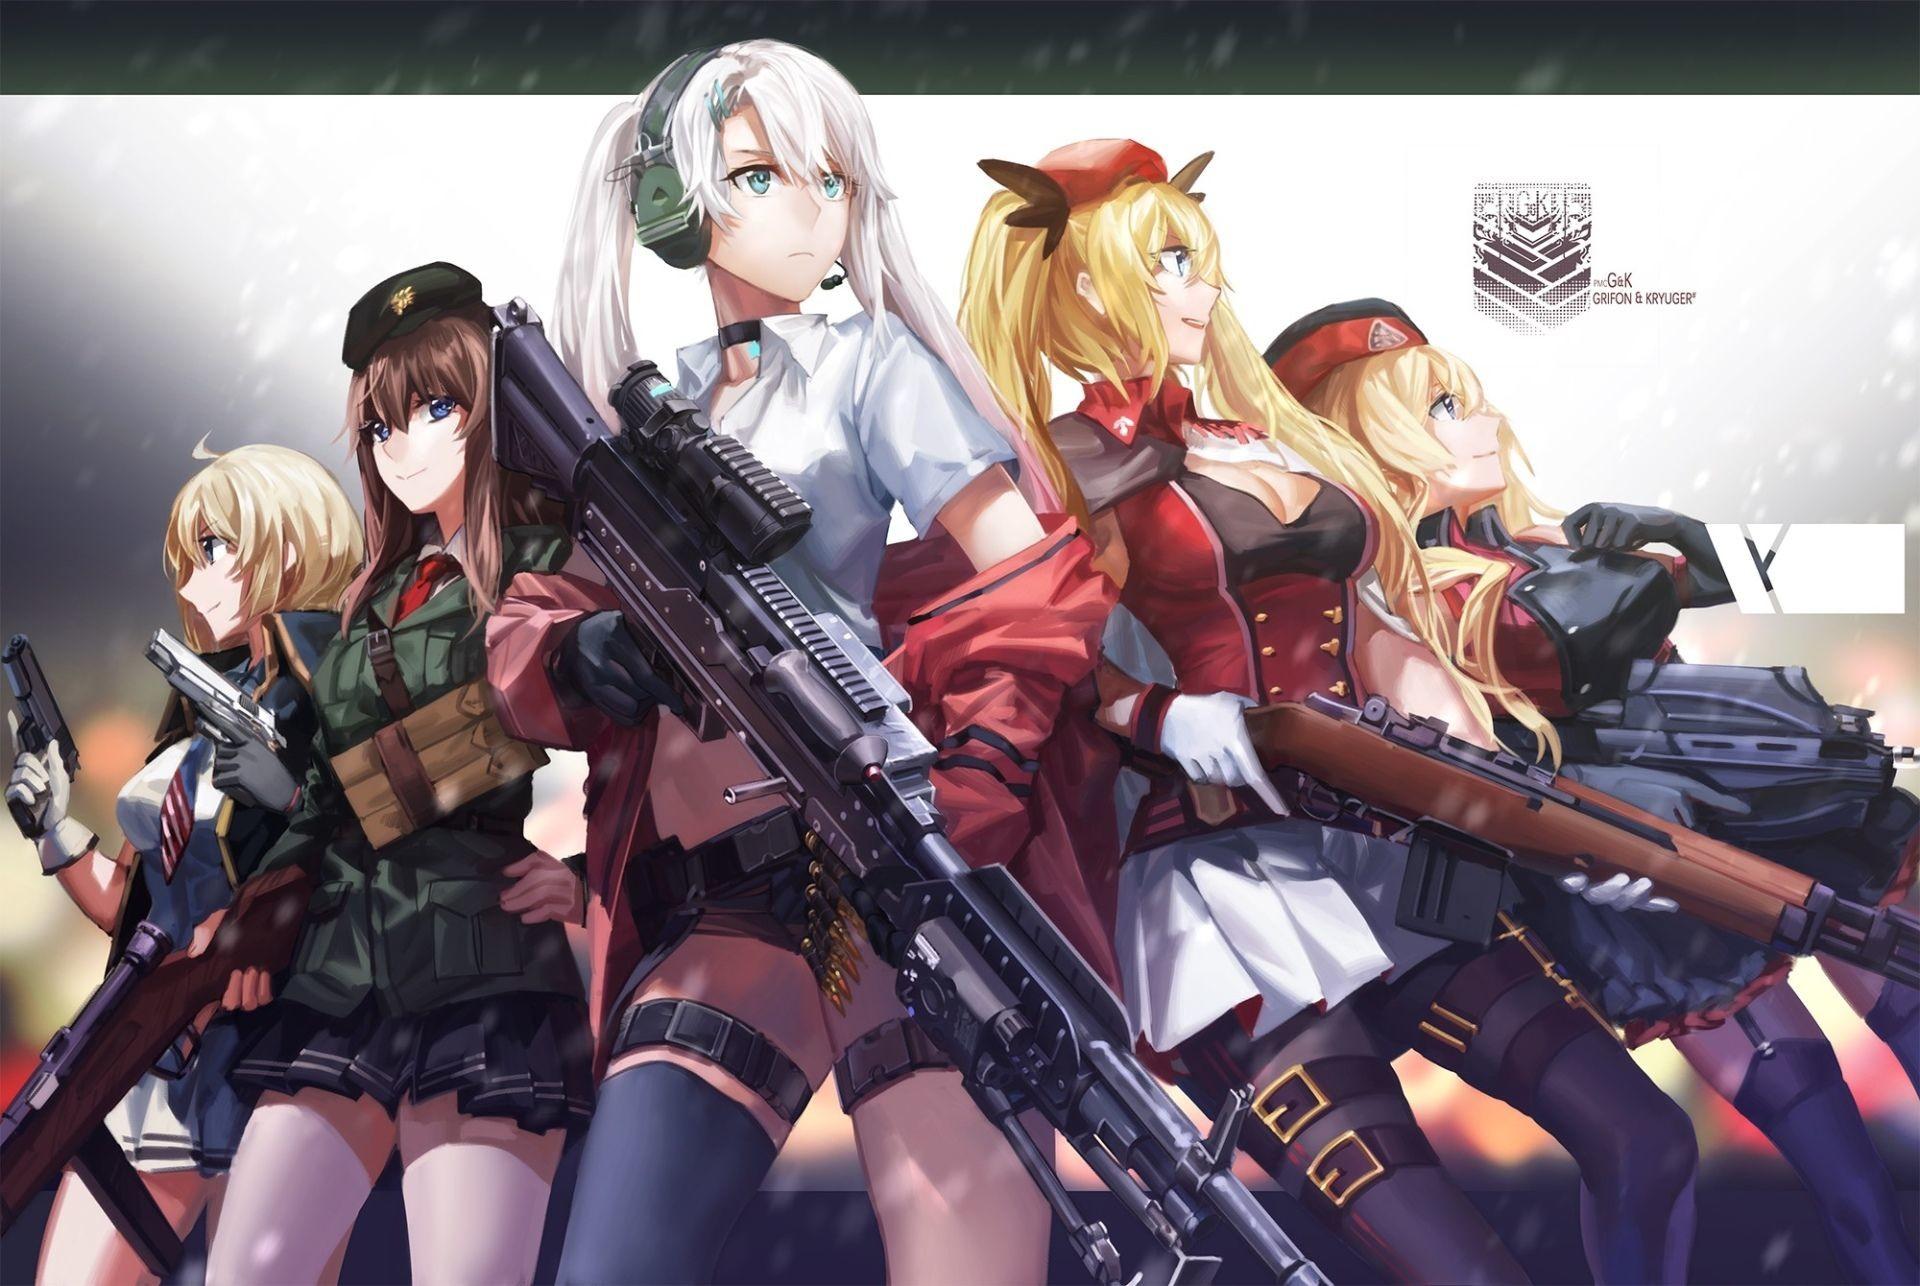 Best Of Anime Girls War Wallpaper Download - Anime Girl With A Gun